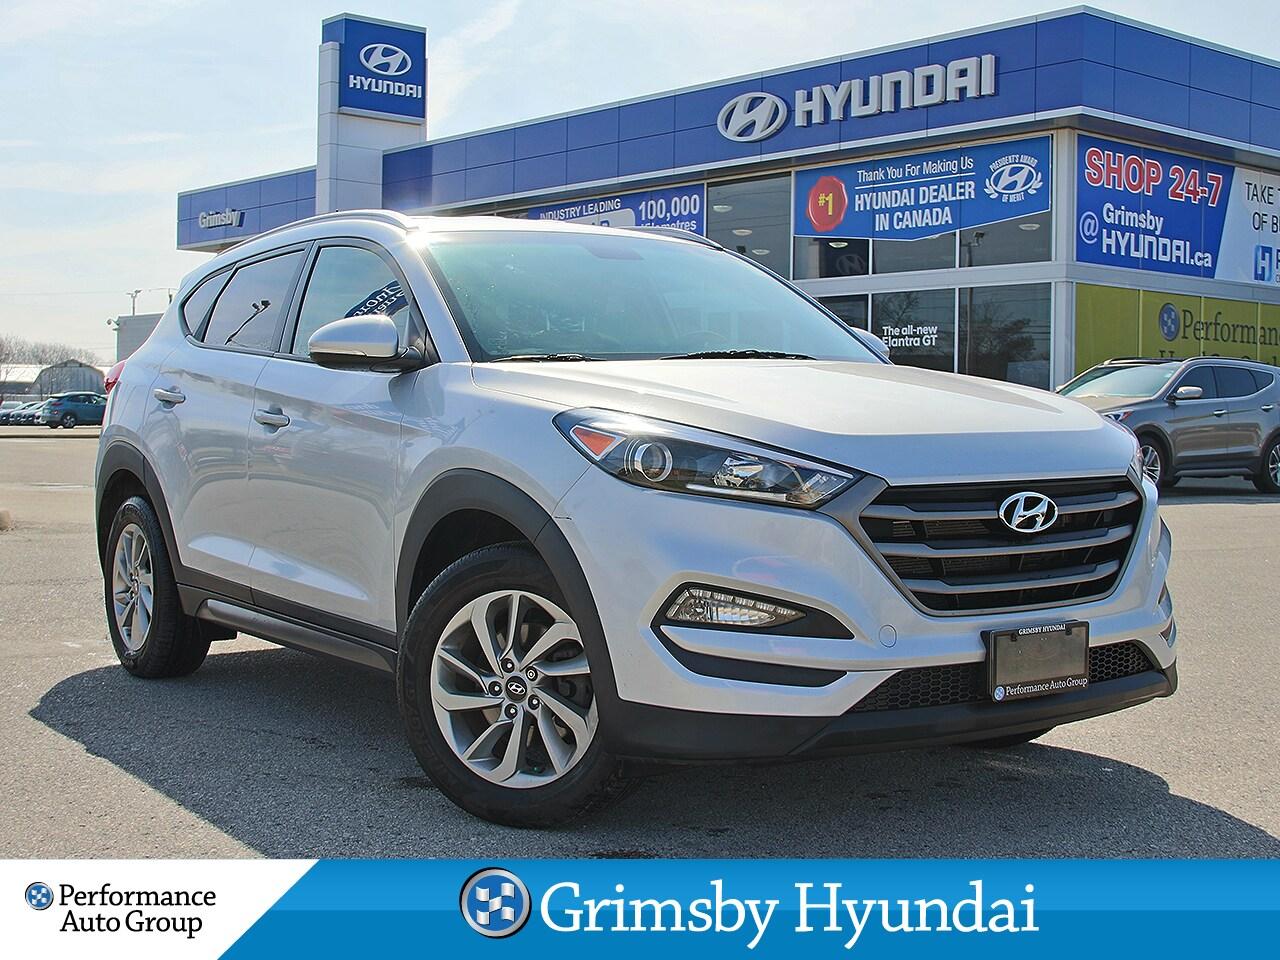 2016 Hyundai Tucson BLUETOOTH / BACK-UP CAMERA / BLIND SPOT DETECTION SUV